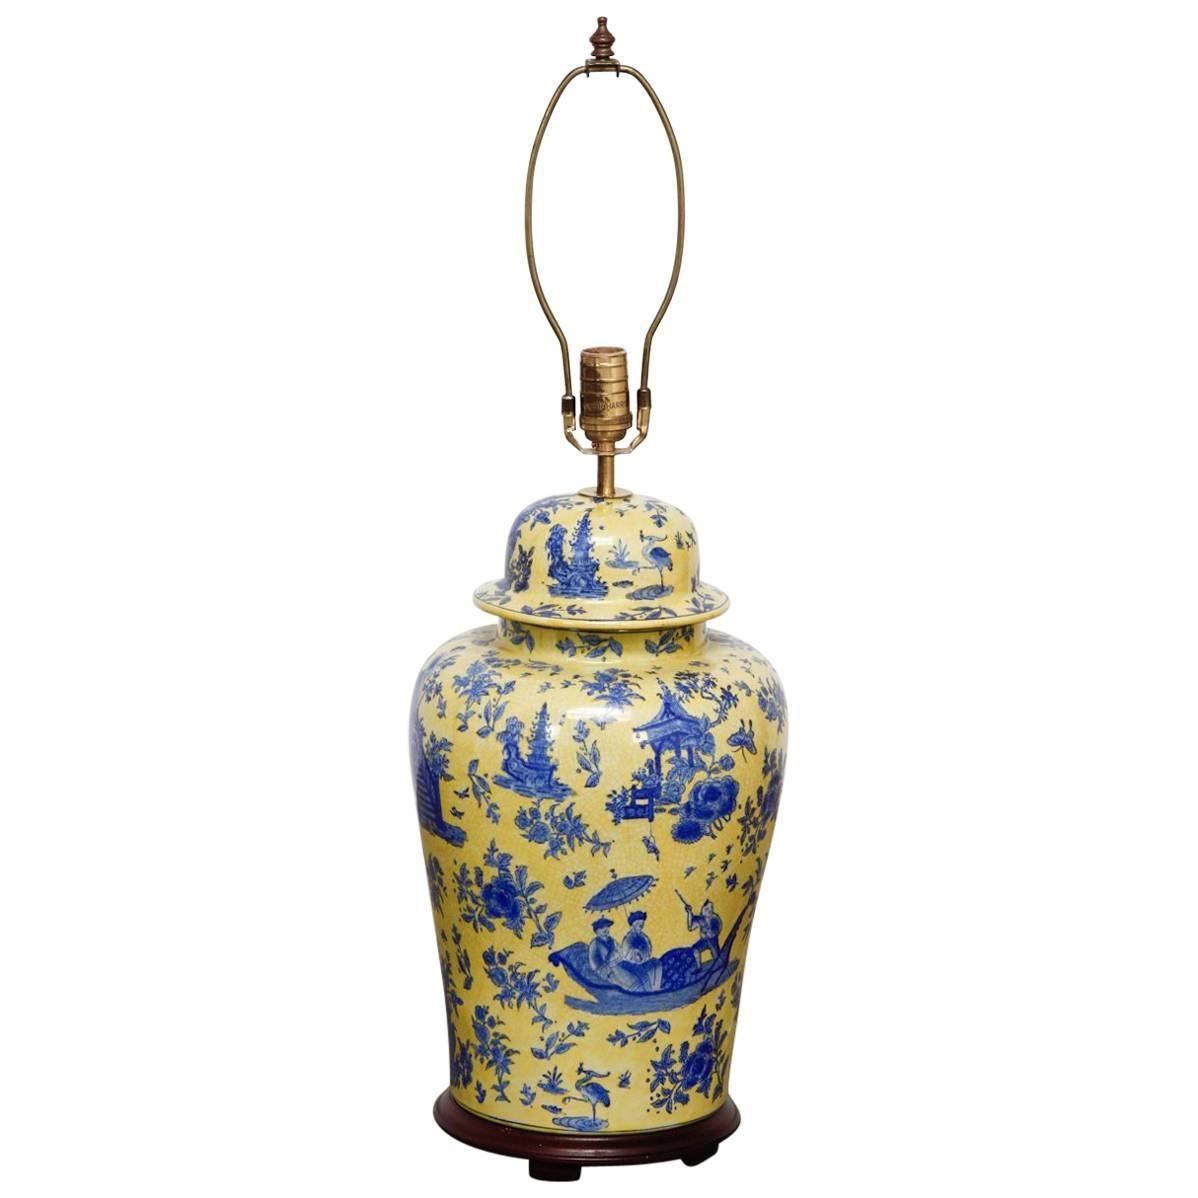 Porcelain Chinoiserie Ginger Jar Lamp by Kinder Harris